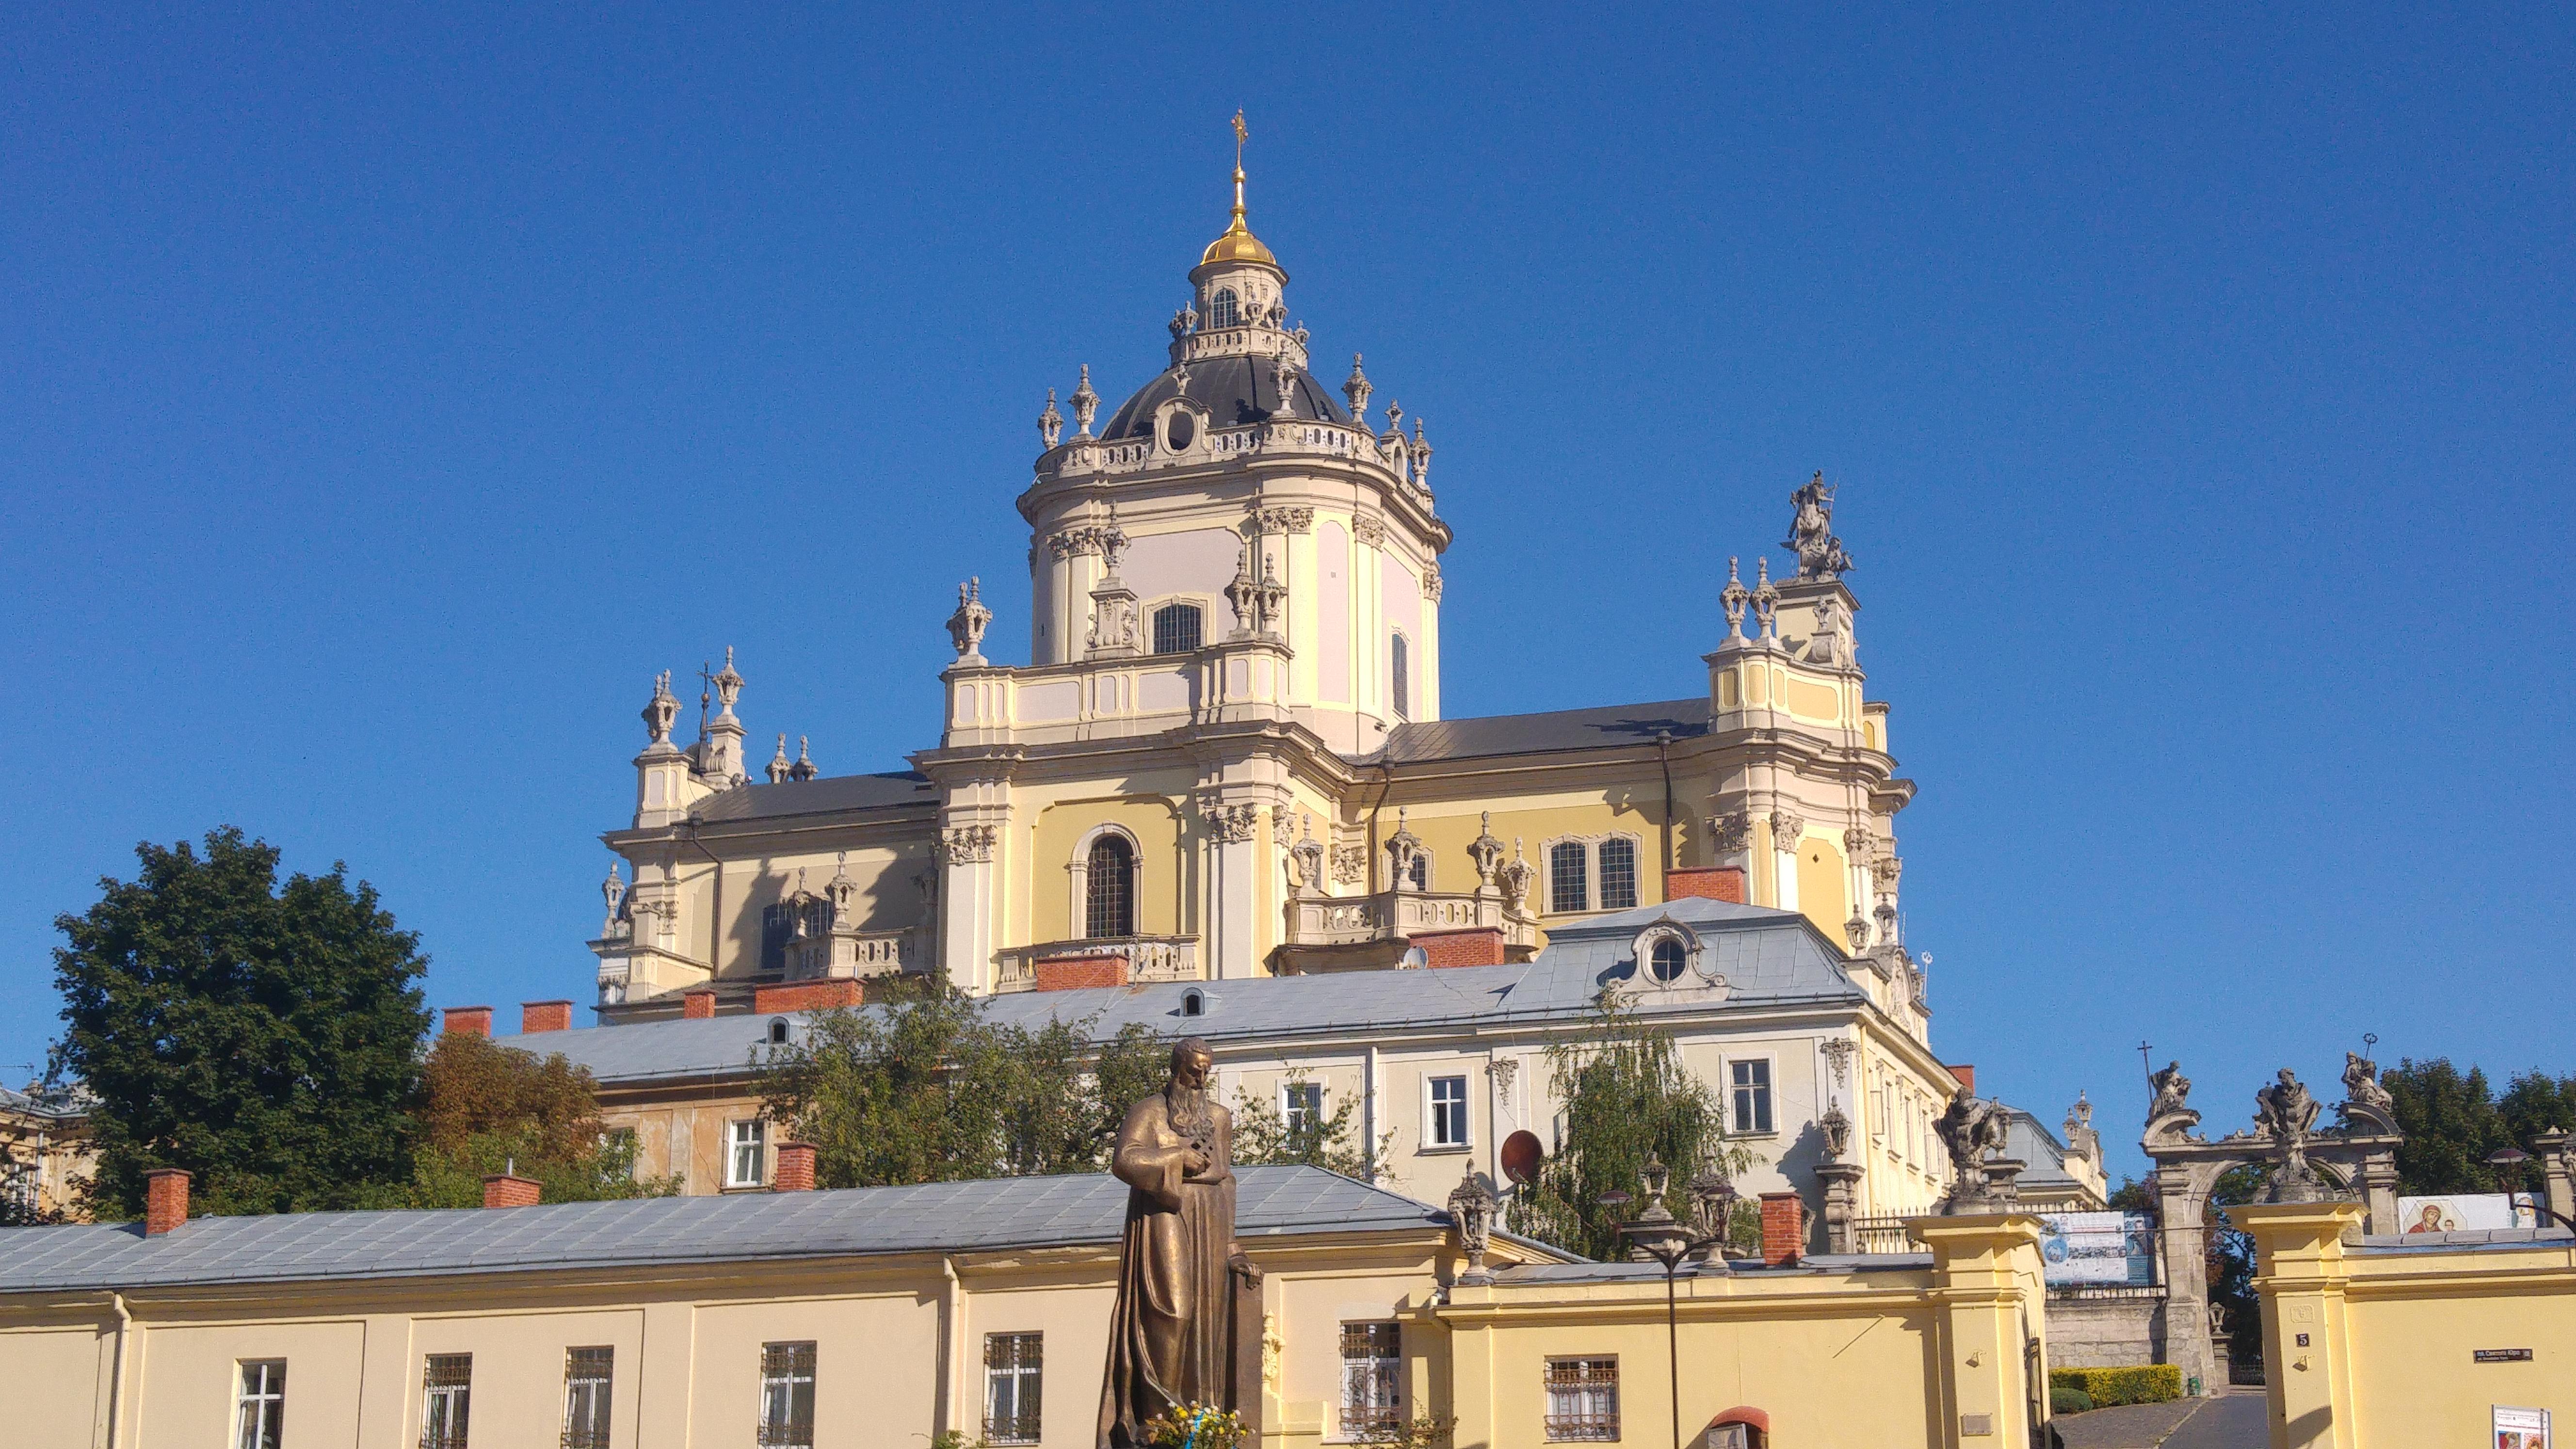 St. George's Katedrali